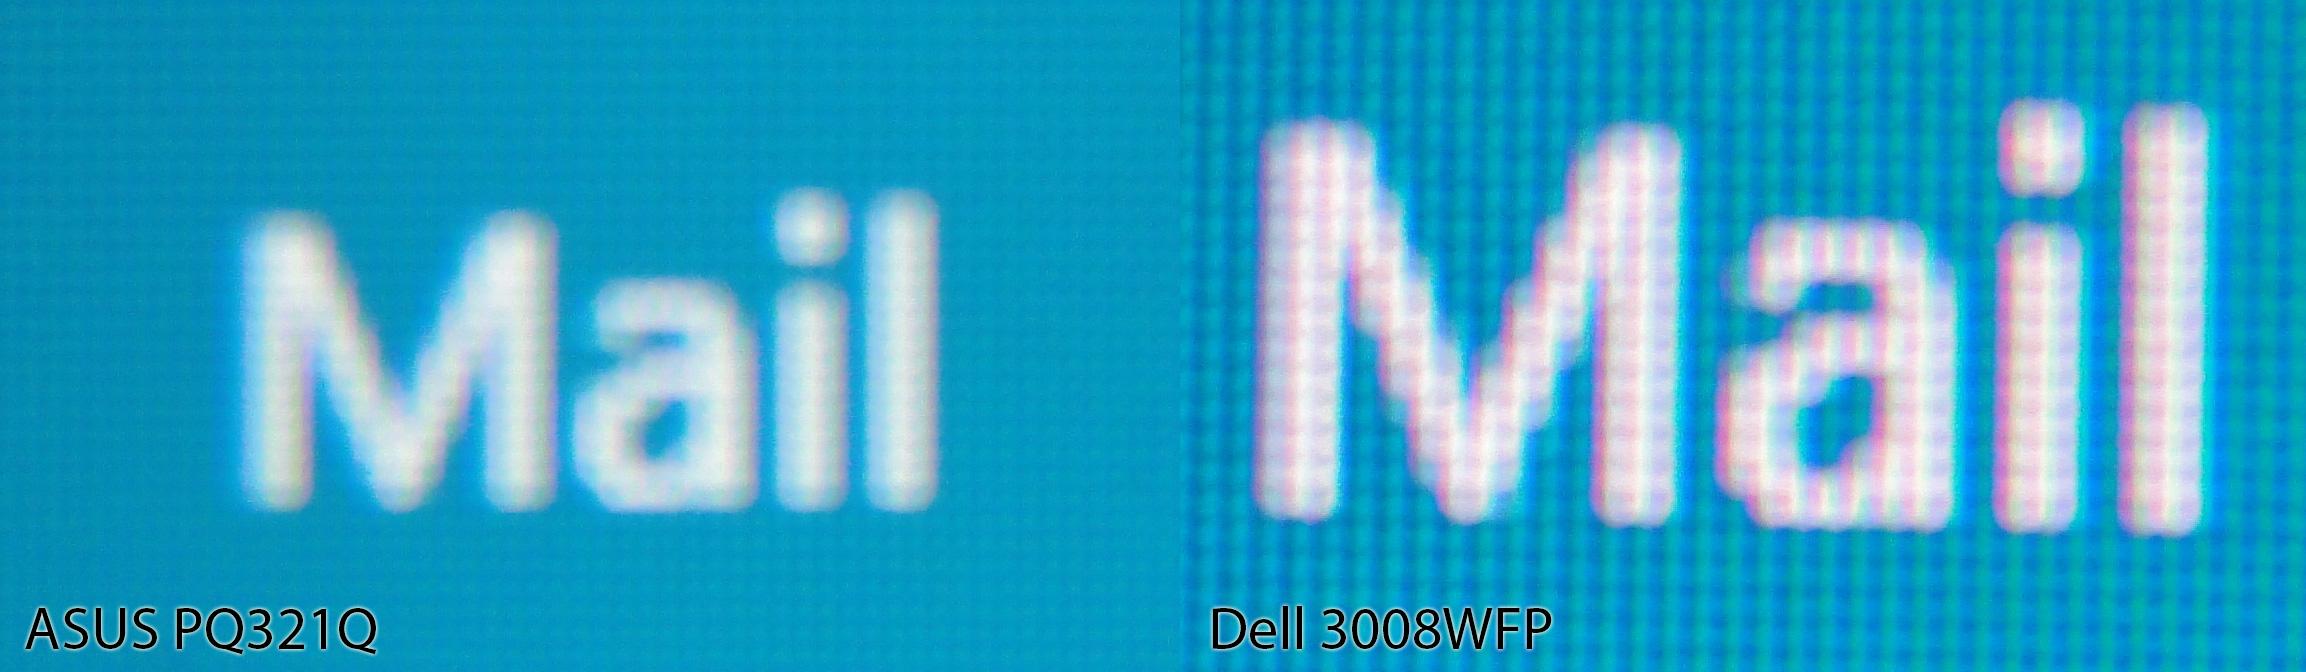 pixels2.jpg